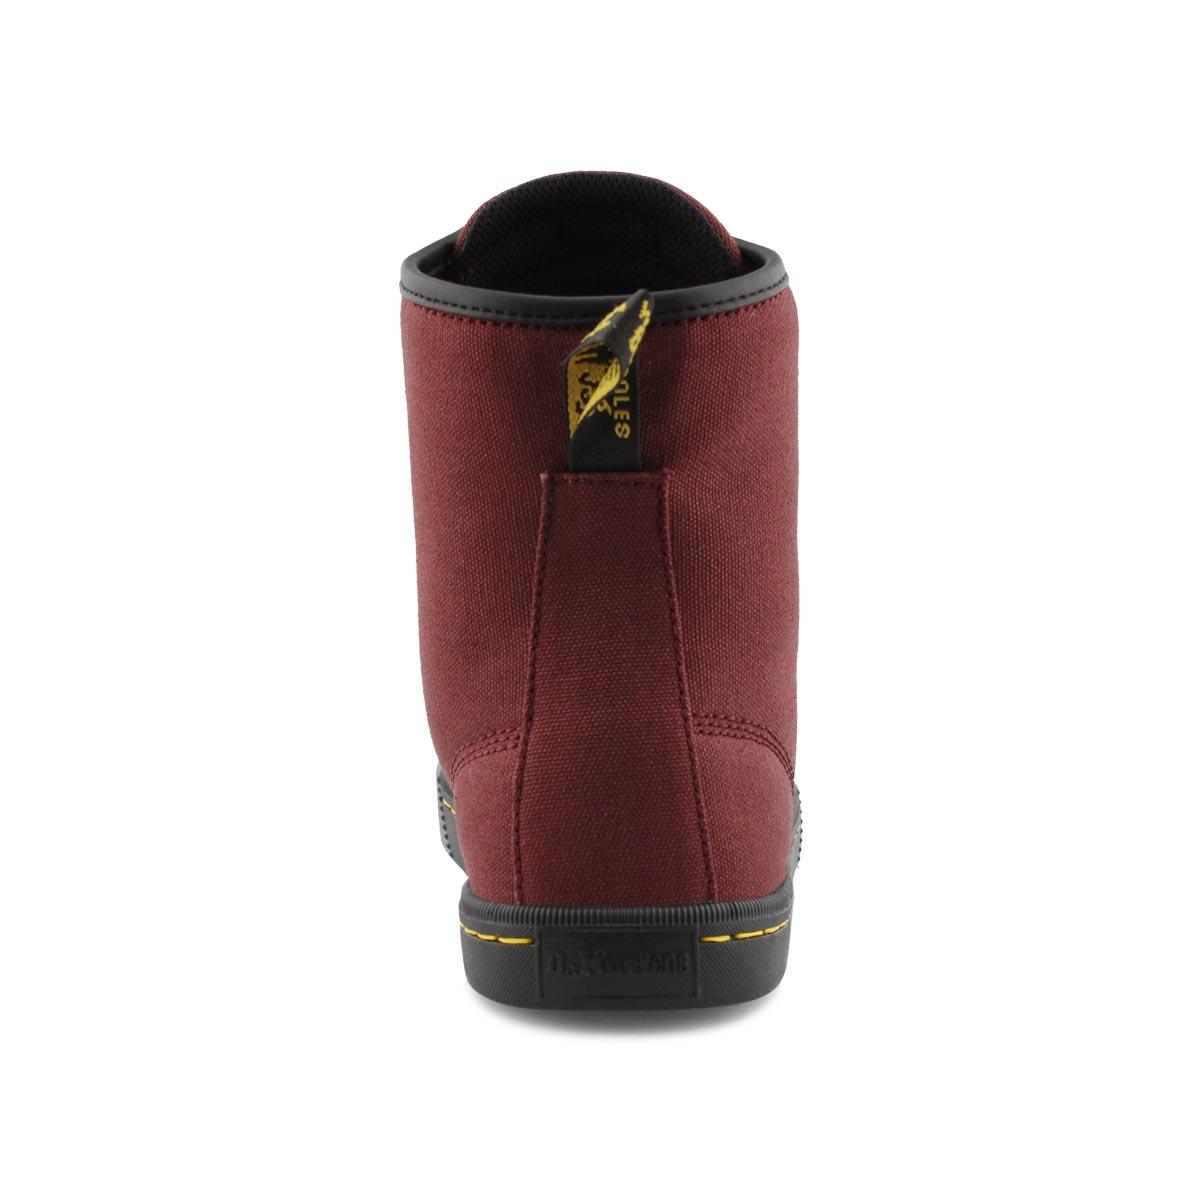 Lds Sheridan oxblood 8 eye boot